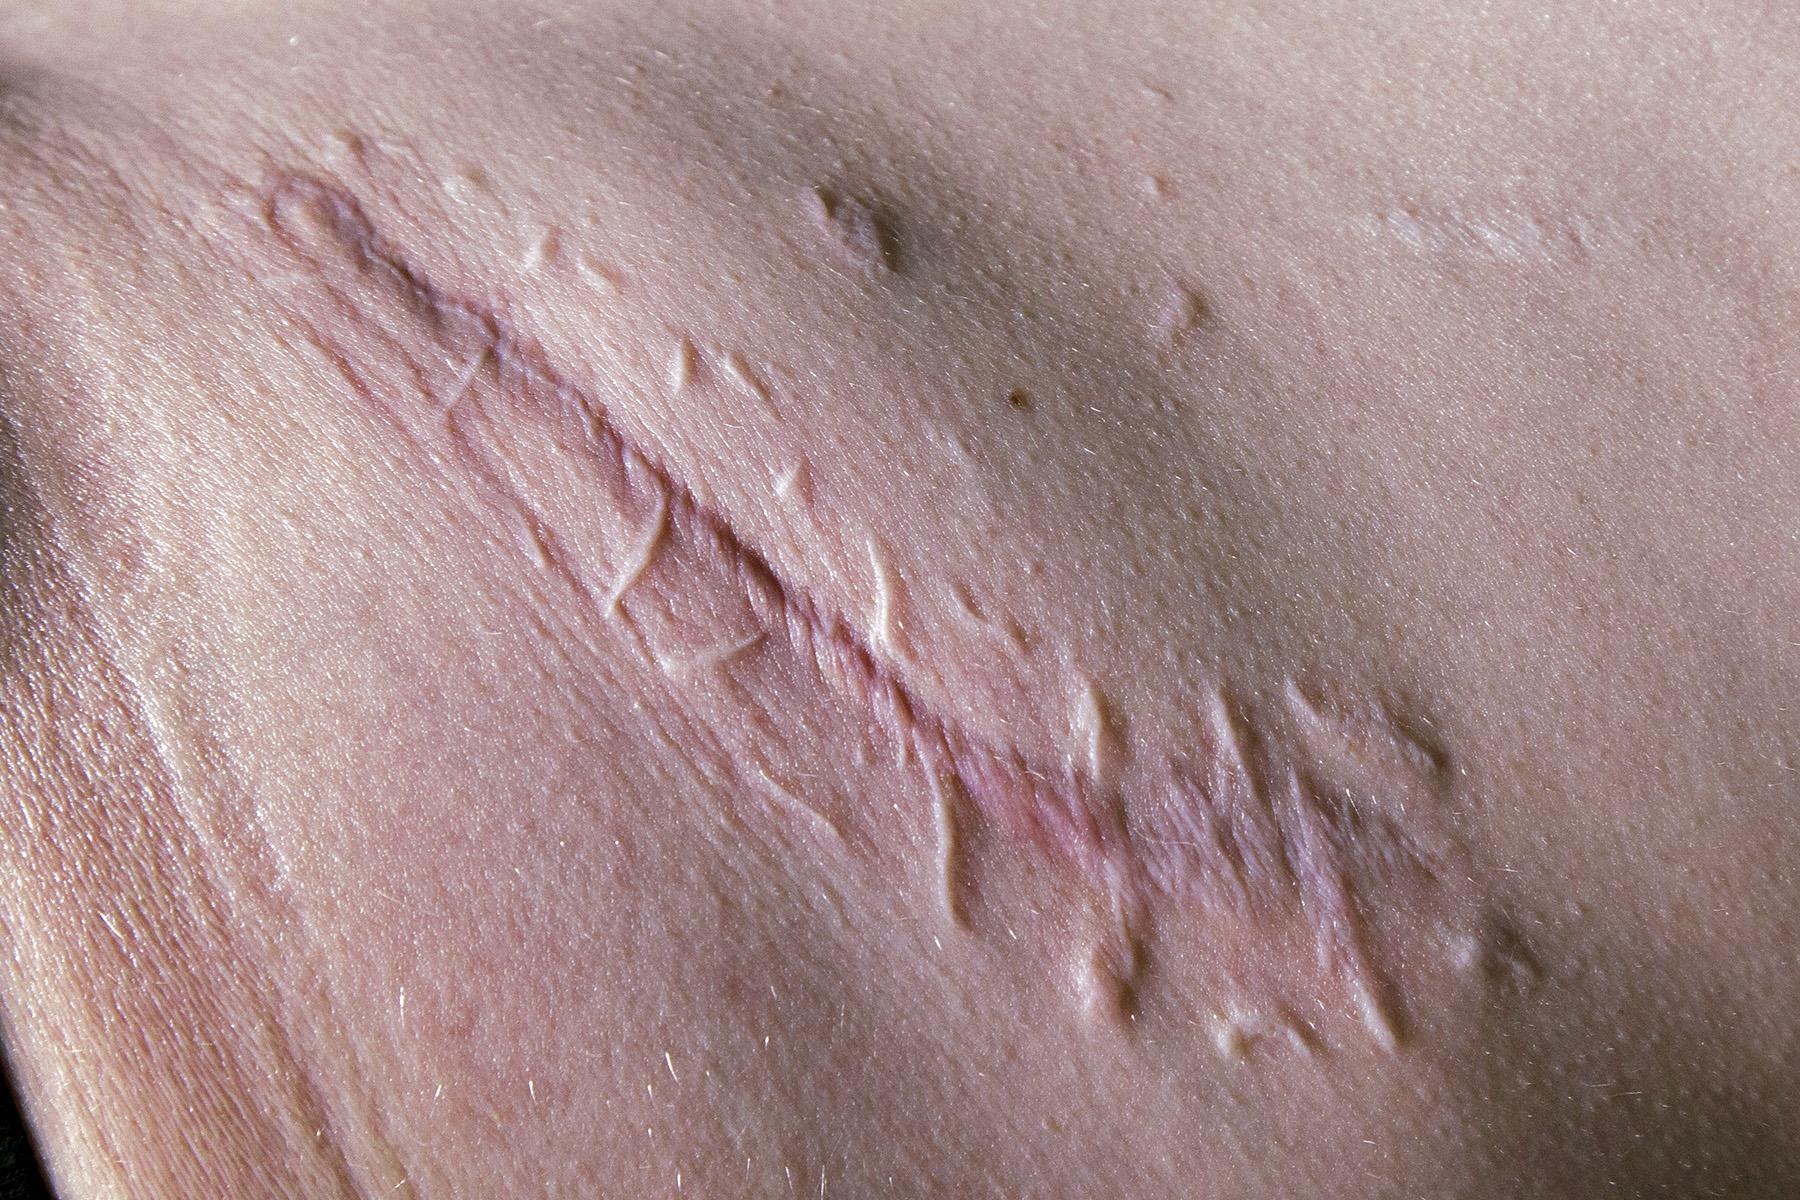 Abdominal Scar for website